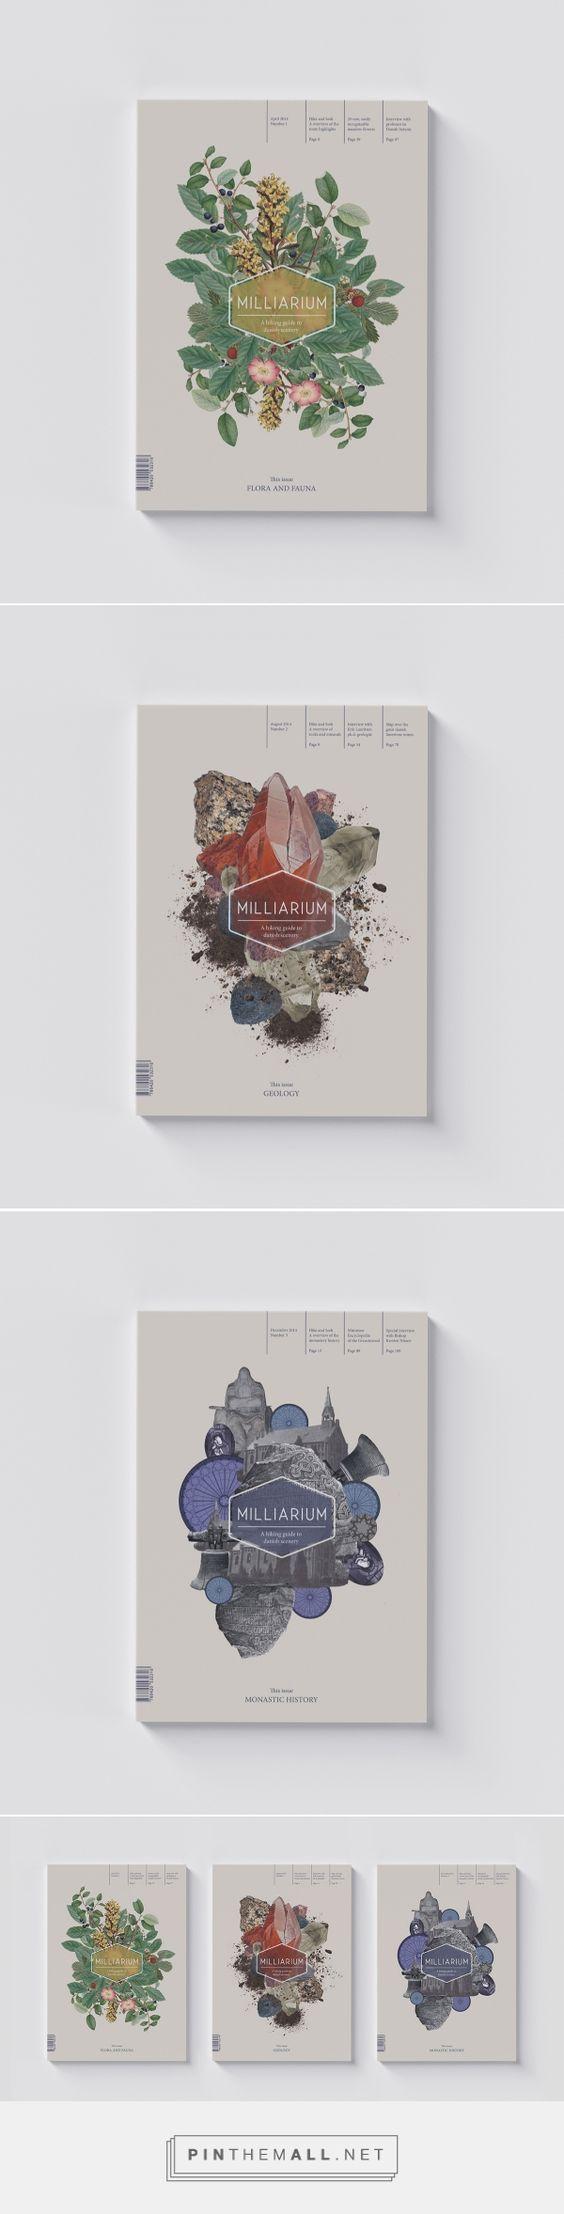 Milliarium Magazine on Behance - created via https://pinthemall.net: